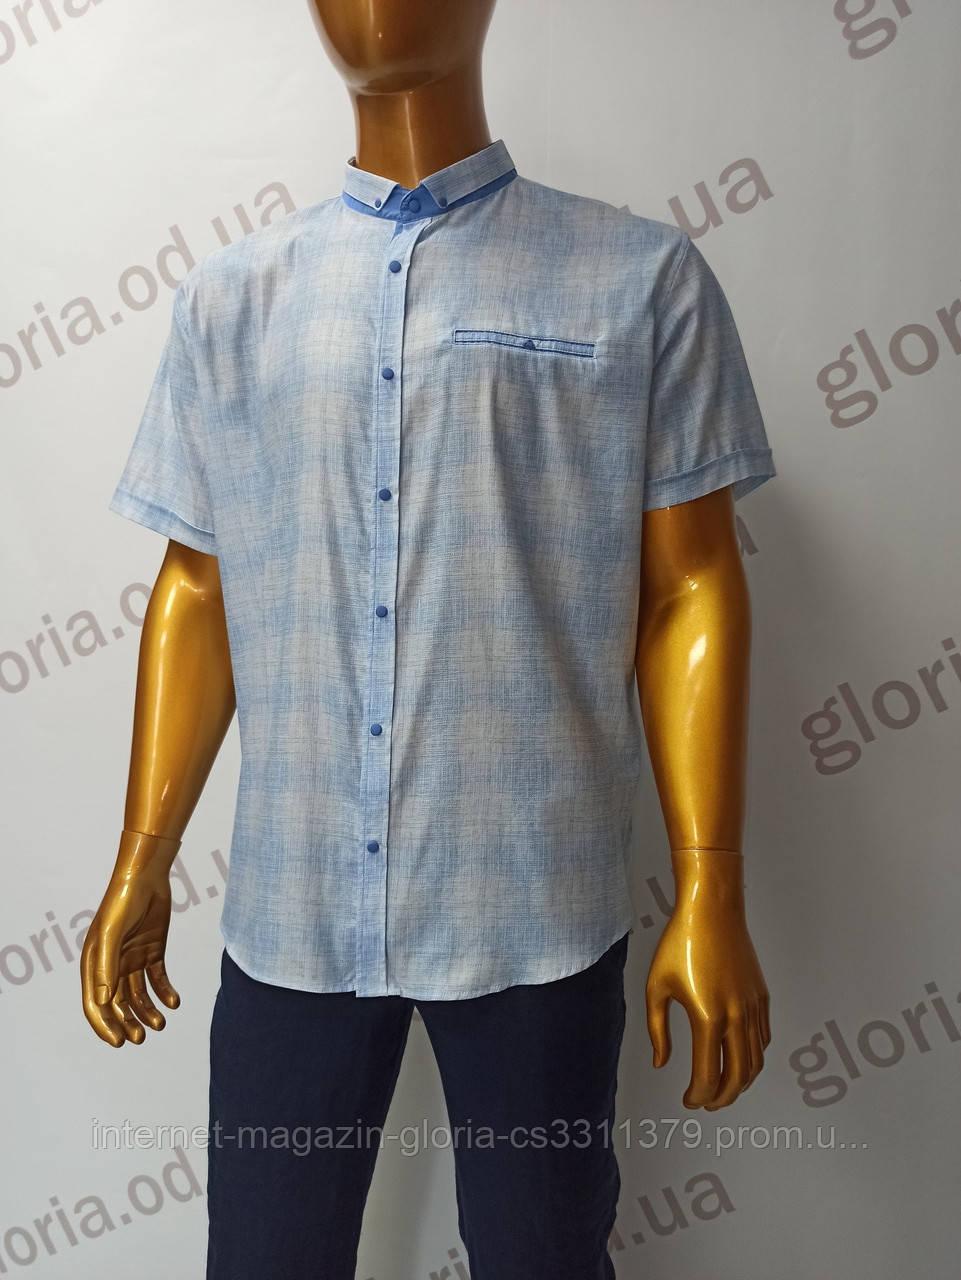 Мужская рубашка Amato. AG  29744(sg). Батал. Размеры: 2XL,3XL,4XL,5XL.